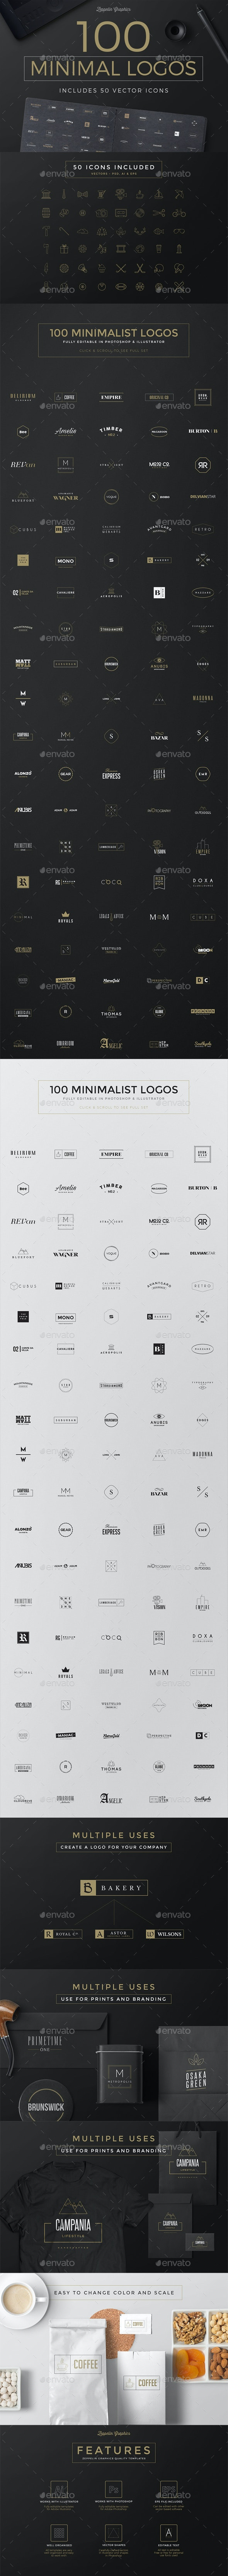 100 Minimal Logos - Badges & Stickers Web Elements